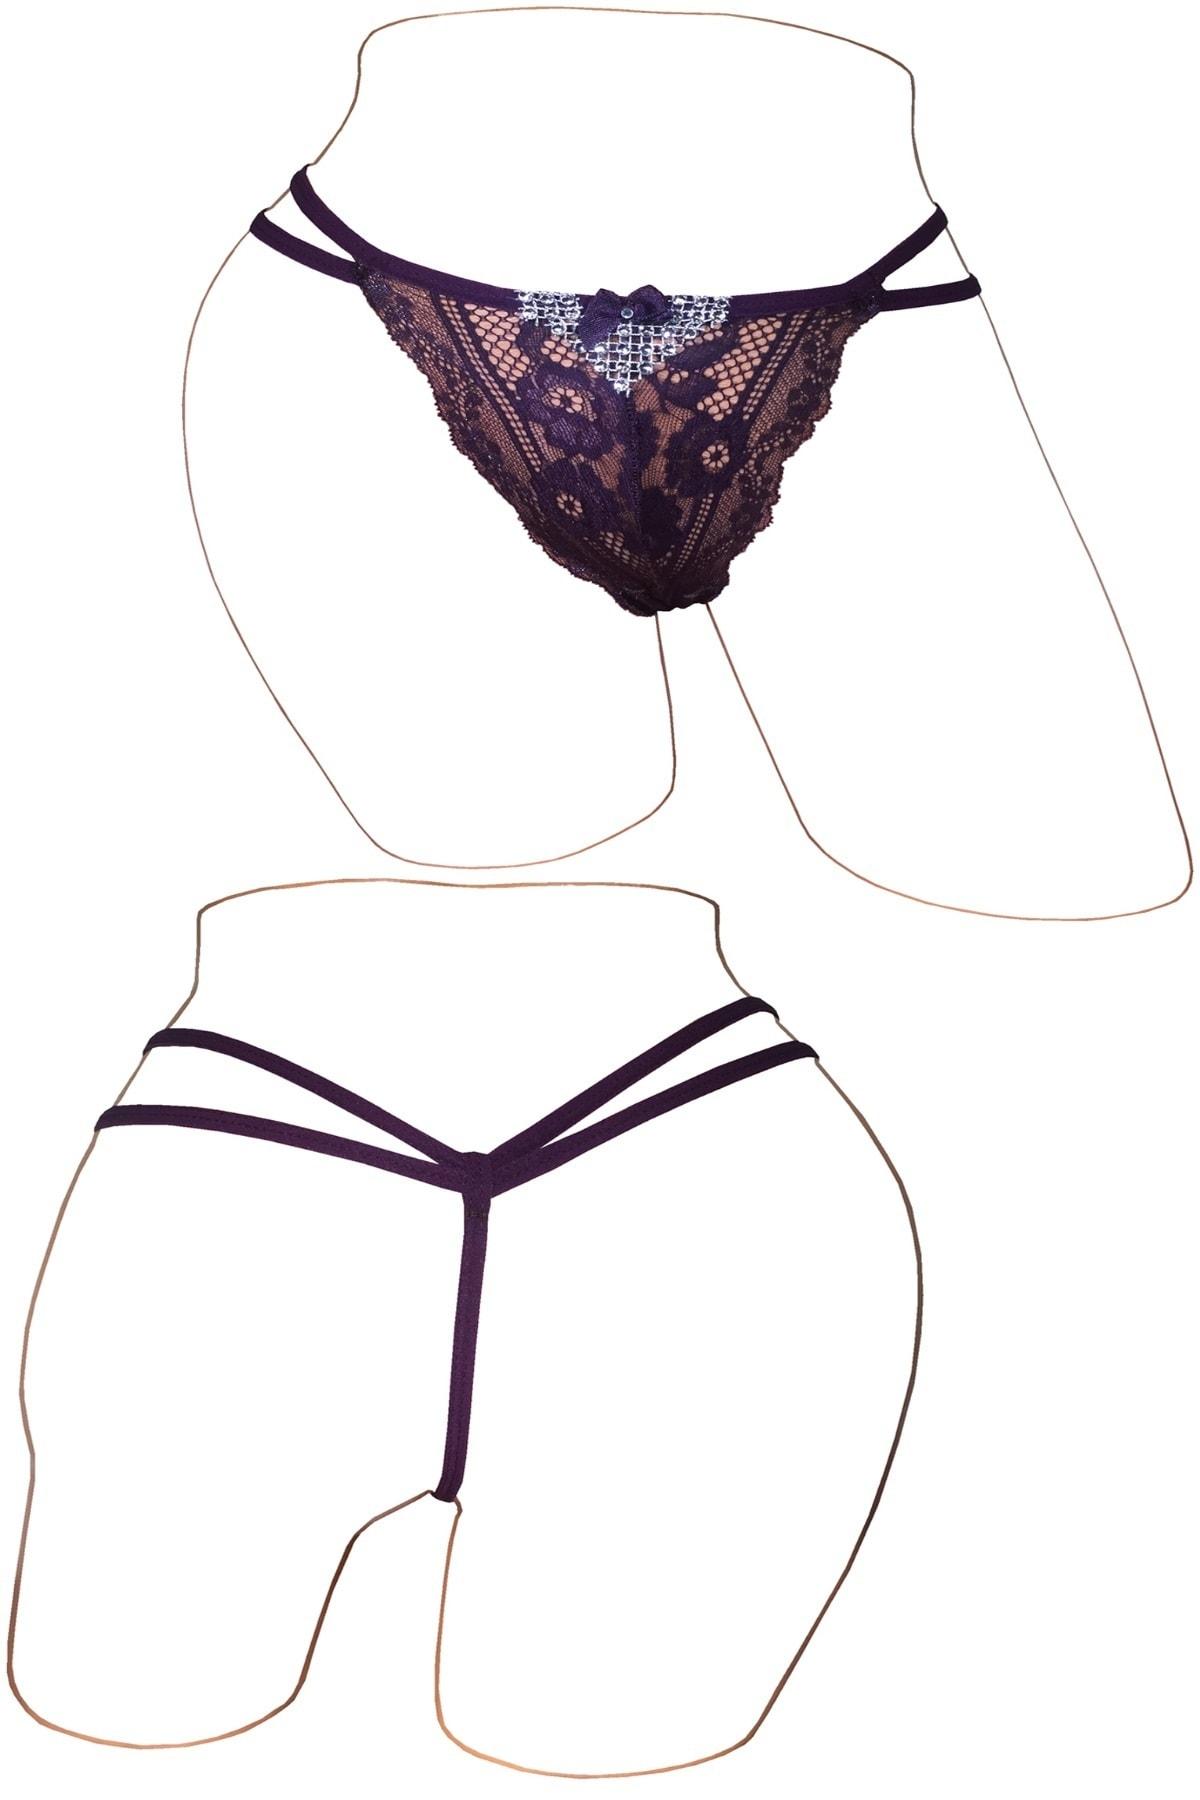 CottonStar Kadın Dantelli Taşlı String / Tanga 5'li Mix Paket 2